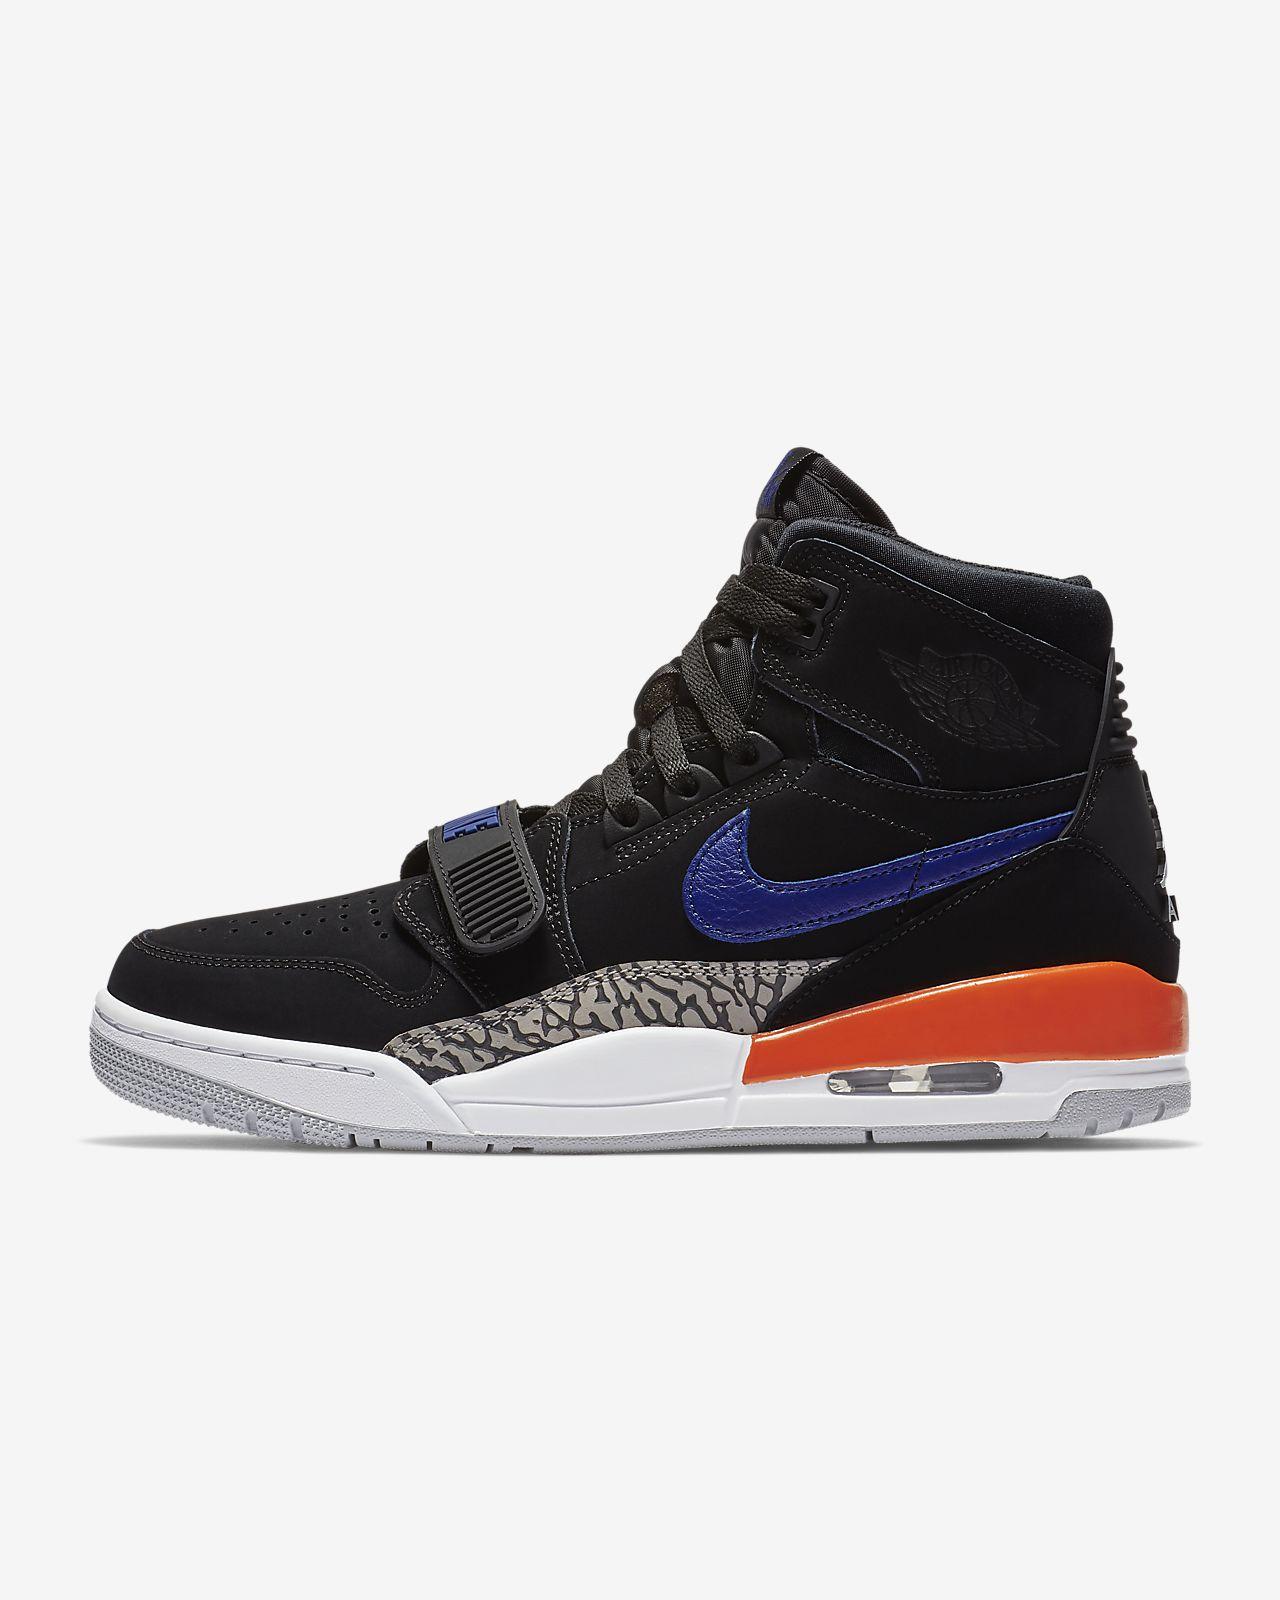 Nike Air Jordan Legacy 312 Chaussure Vente flash Homme BlancPoil de carotte